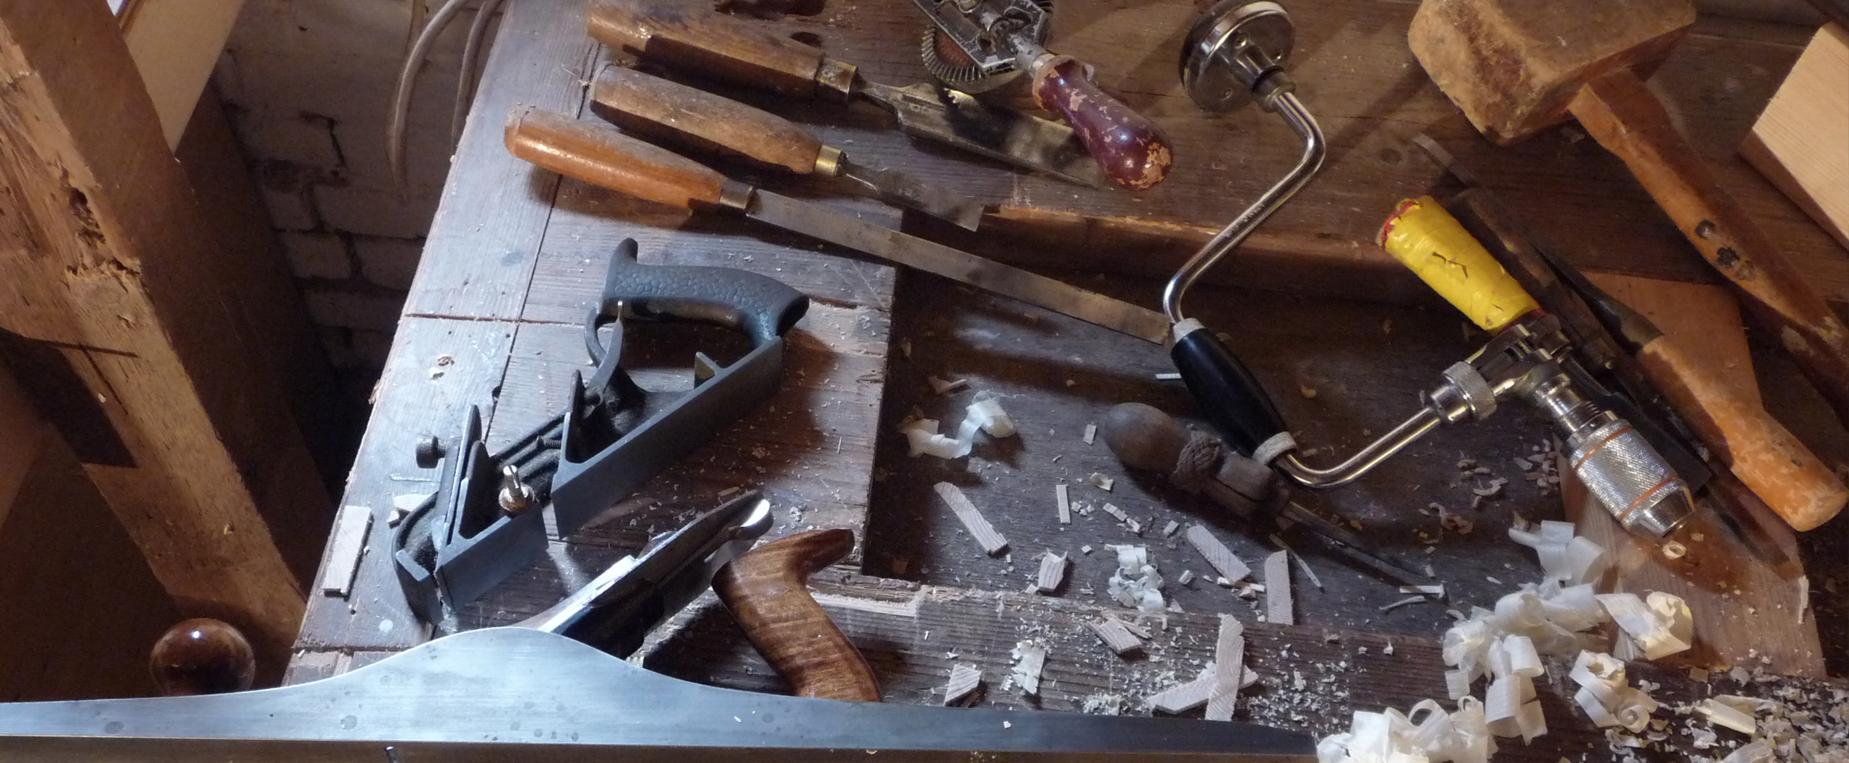 Tool of the carpenter